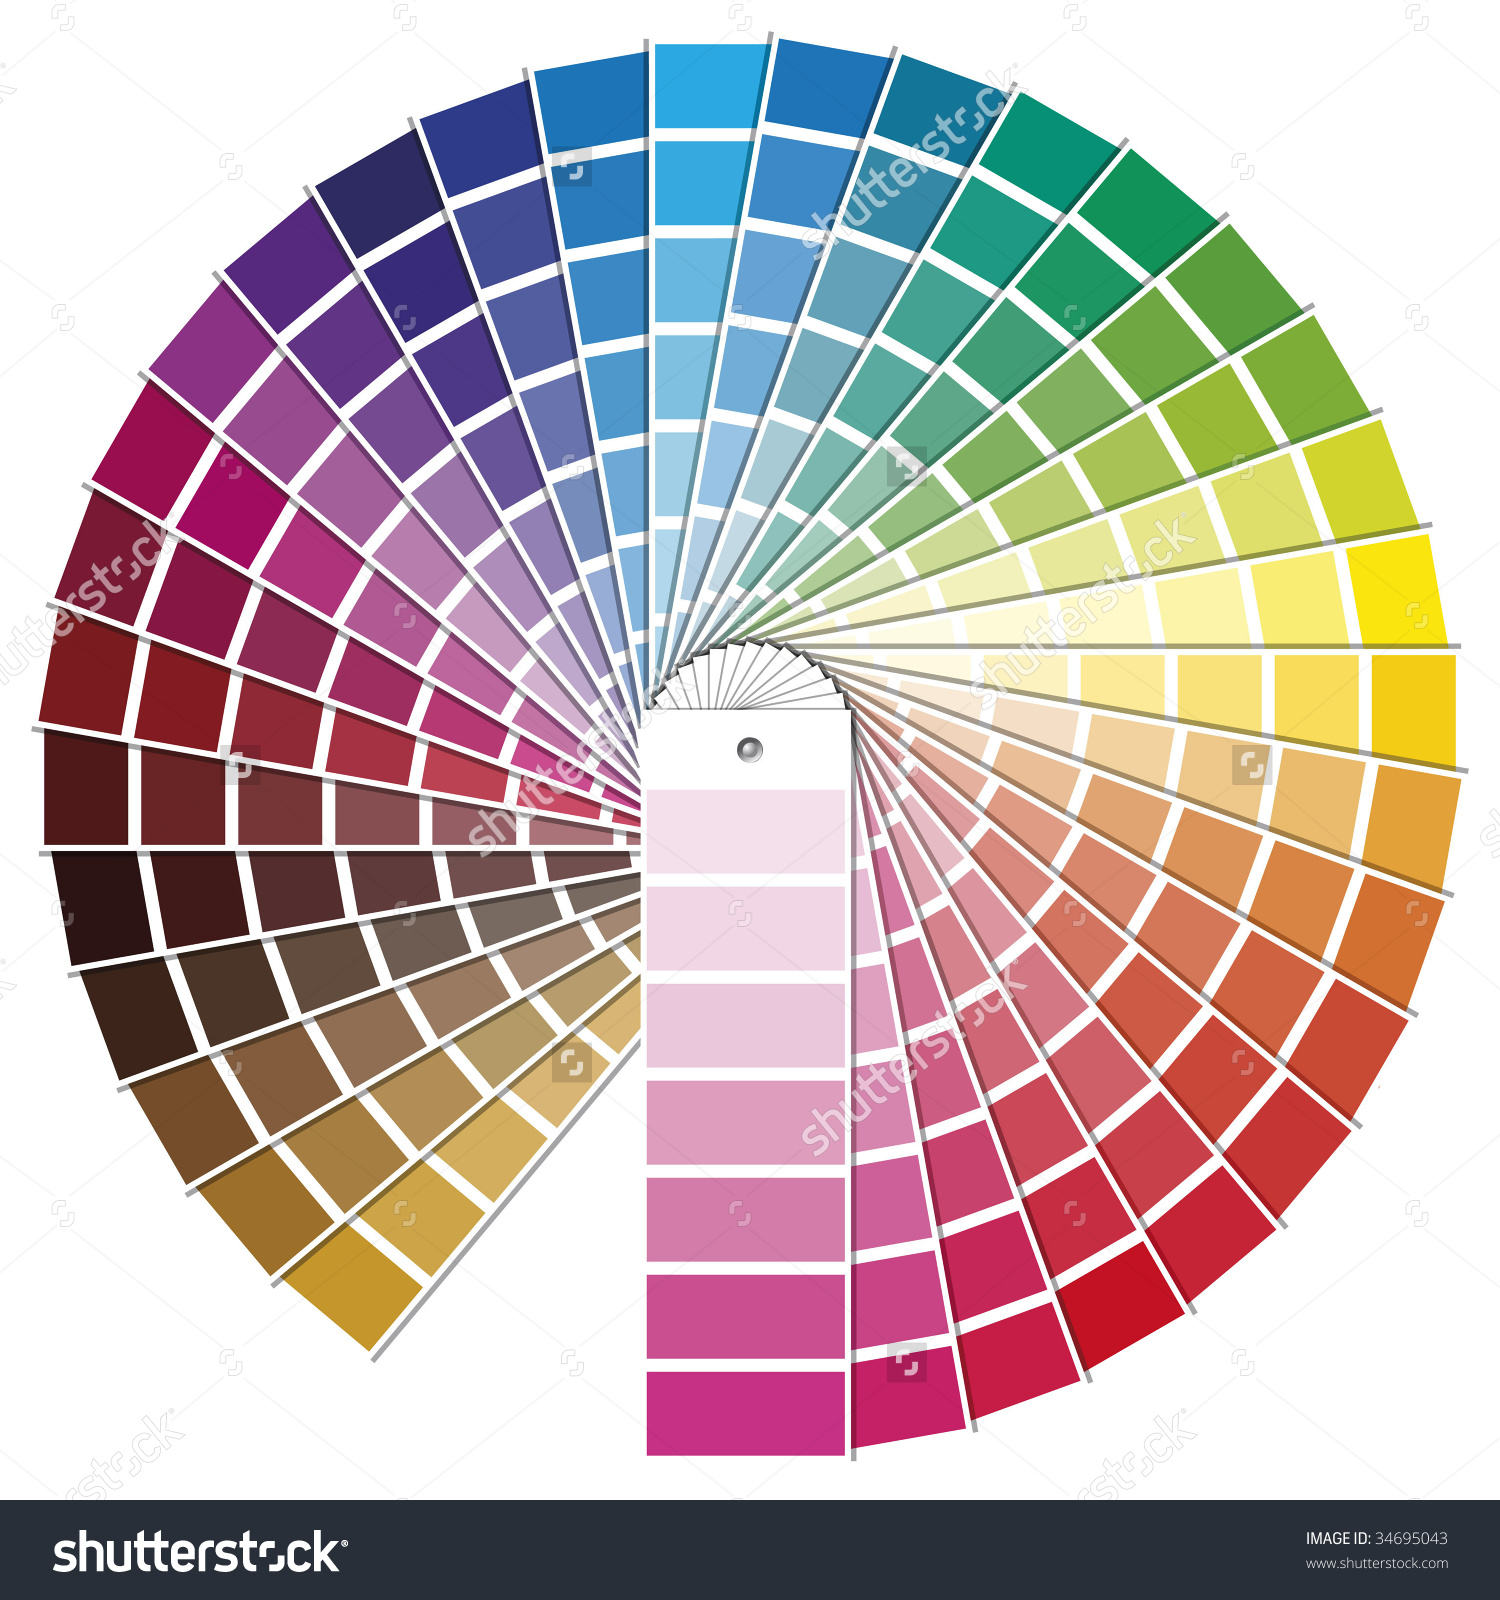 Vector Illustration Pantone Color Model Stock Vector 34695043.